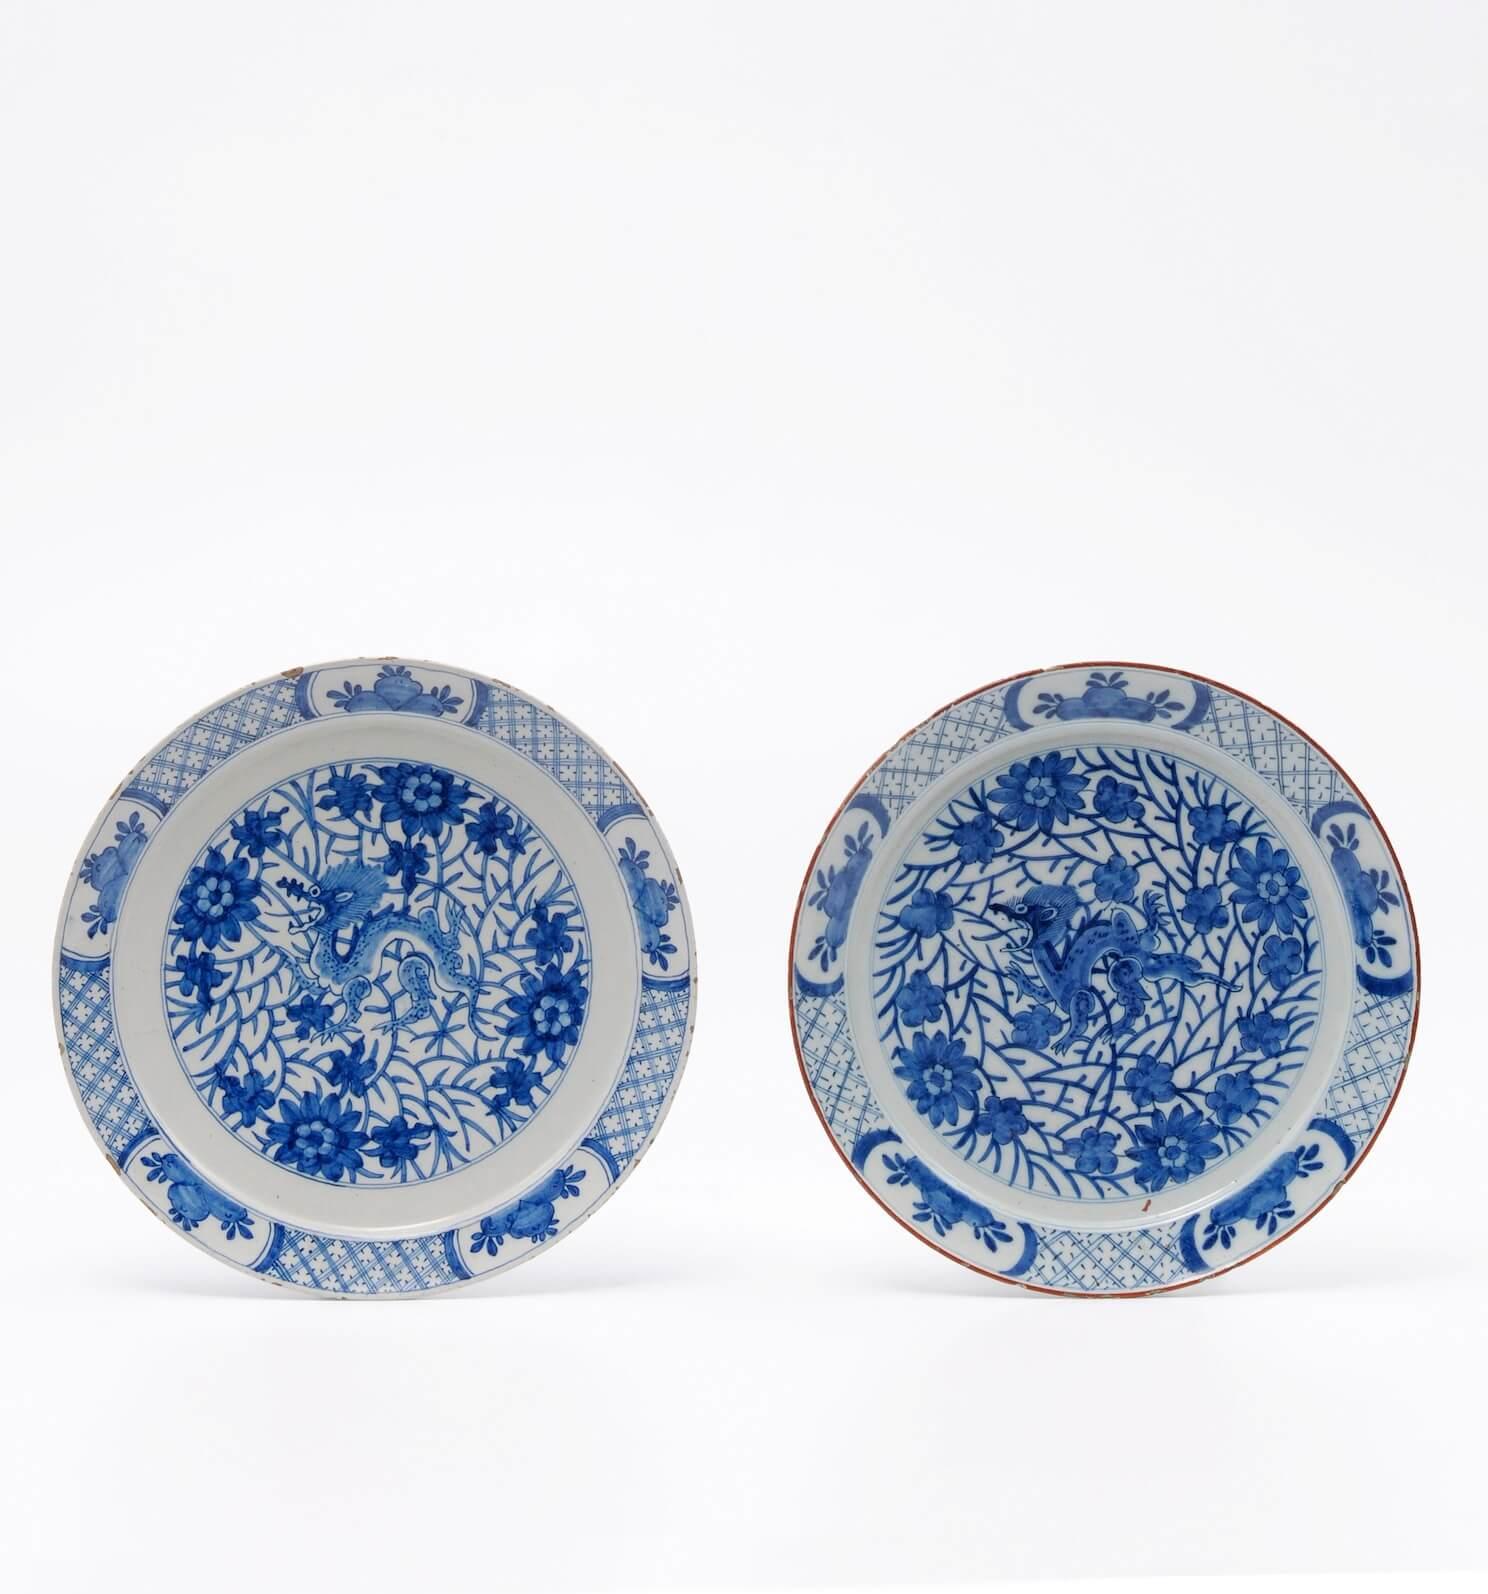 Antique dragon pattern plates delftware at Aronson Antiquairs